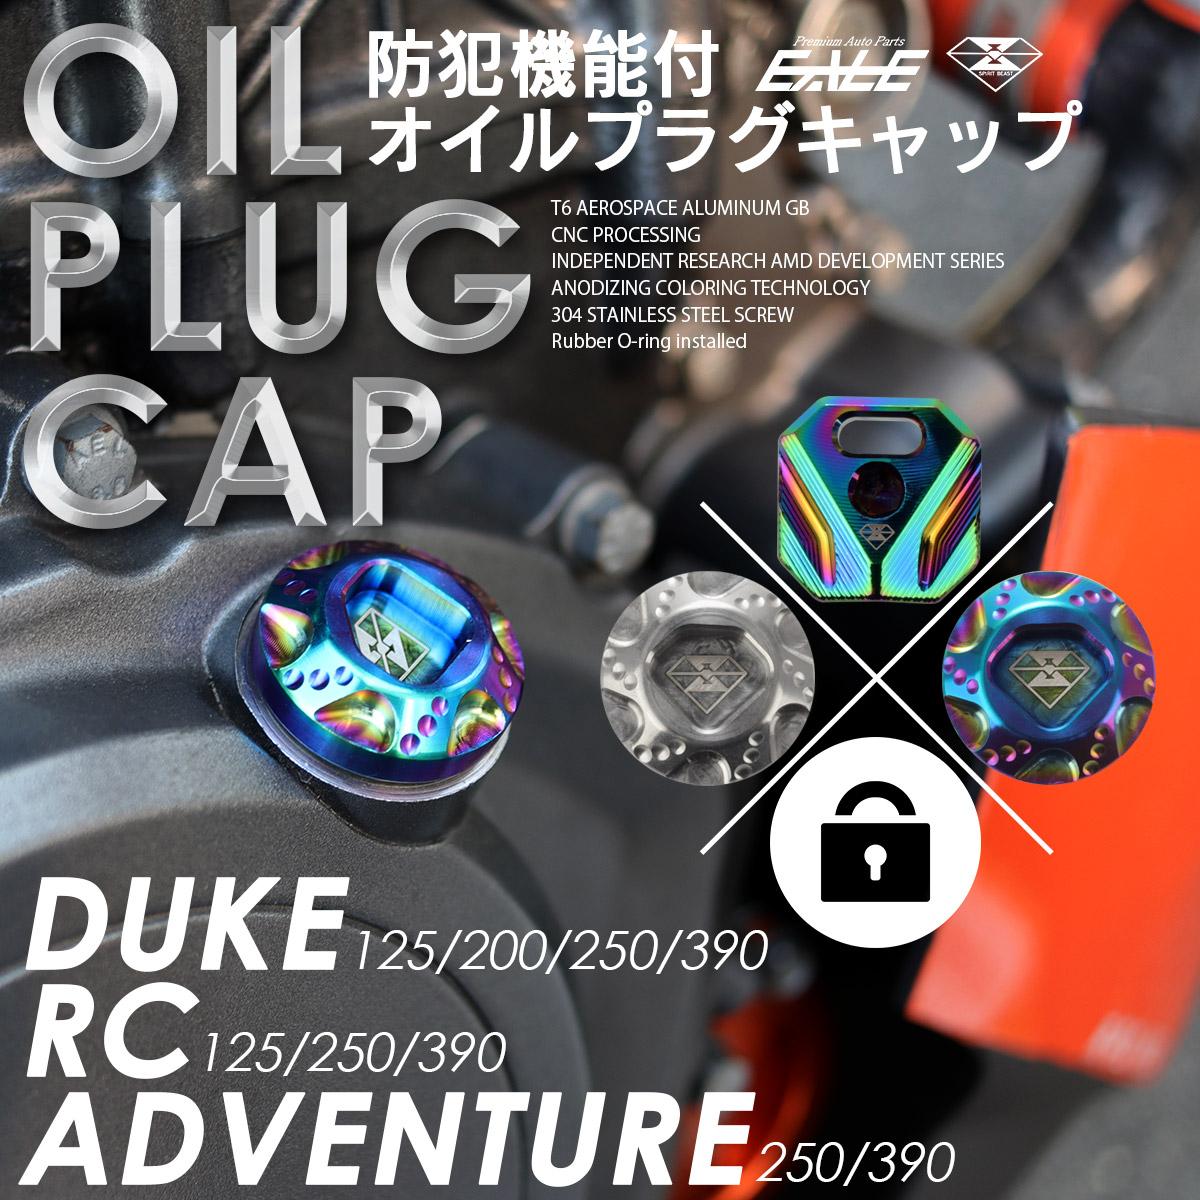 KTM車 オイルプラグキャップ フィラーキャップ 防犯仕様 DUKE 125 200 250 390 RC 125 250 390 専用 S-967